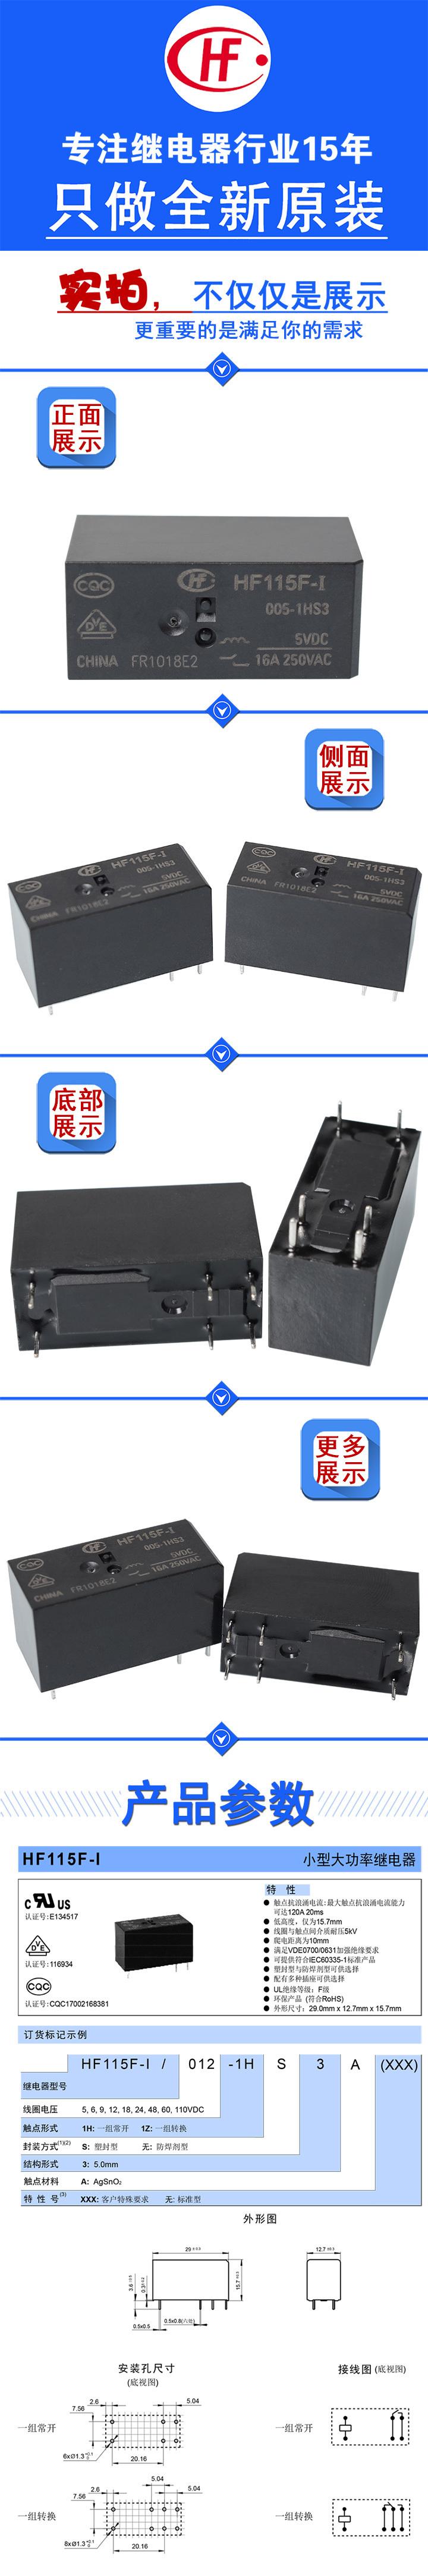 HF115F-I-005-1HS3-720_01